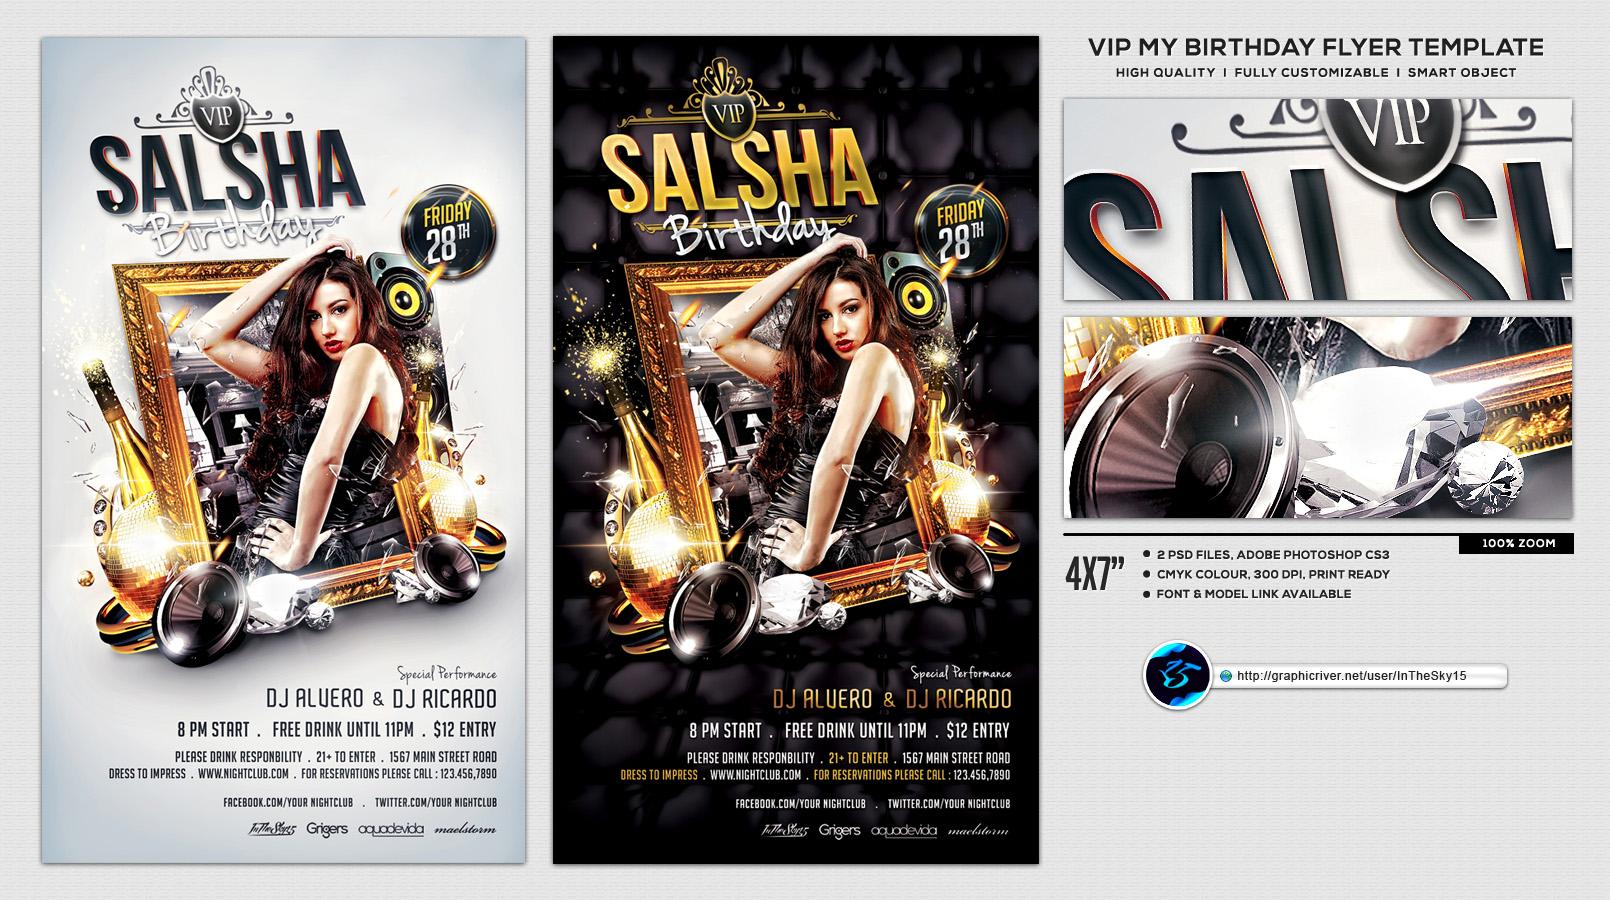 Bday Bash Flyer By Blndesigns Deviantart – Dibujos Para Colorear